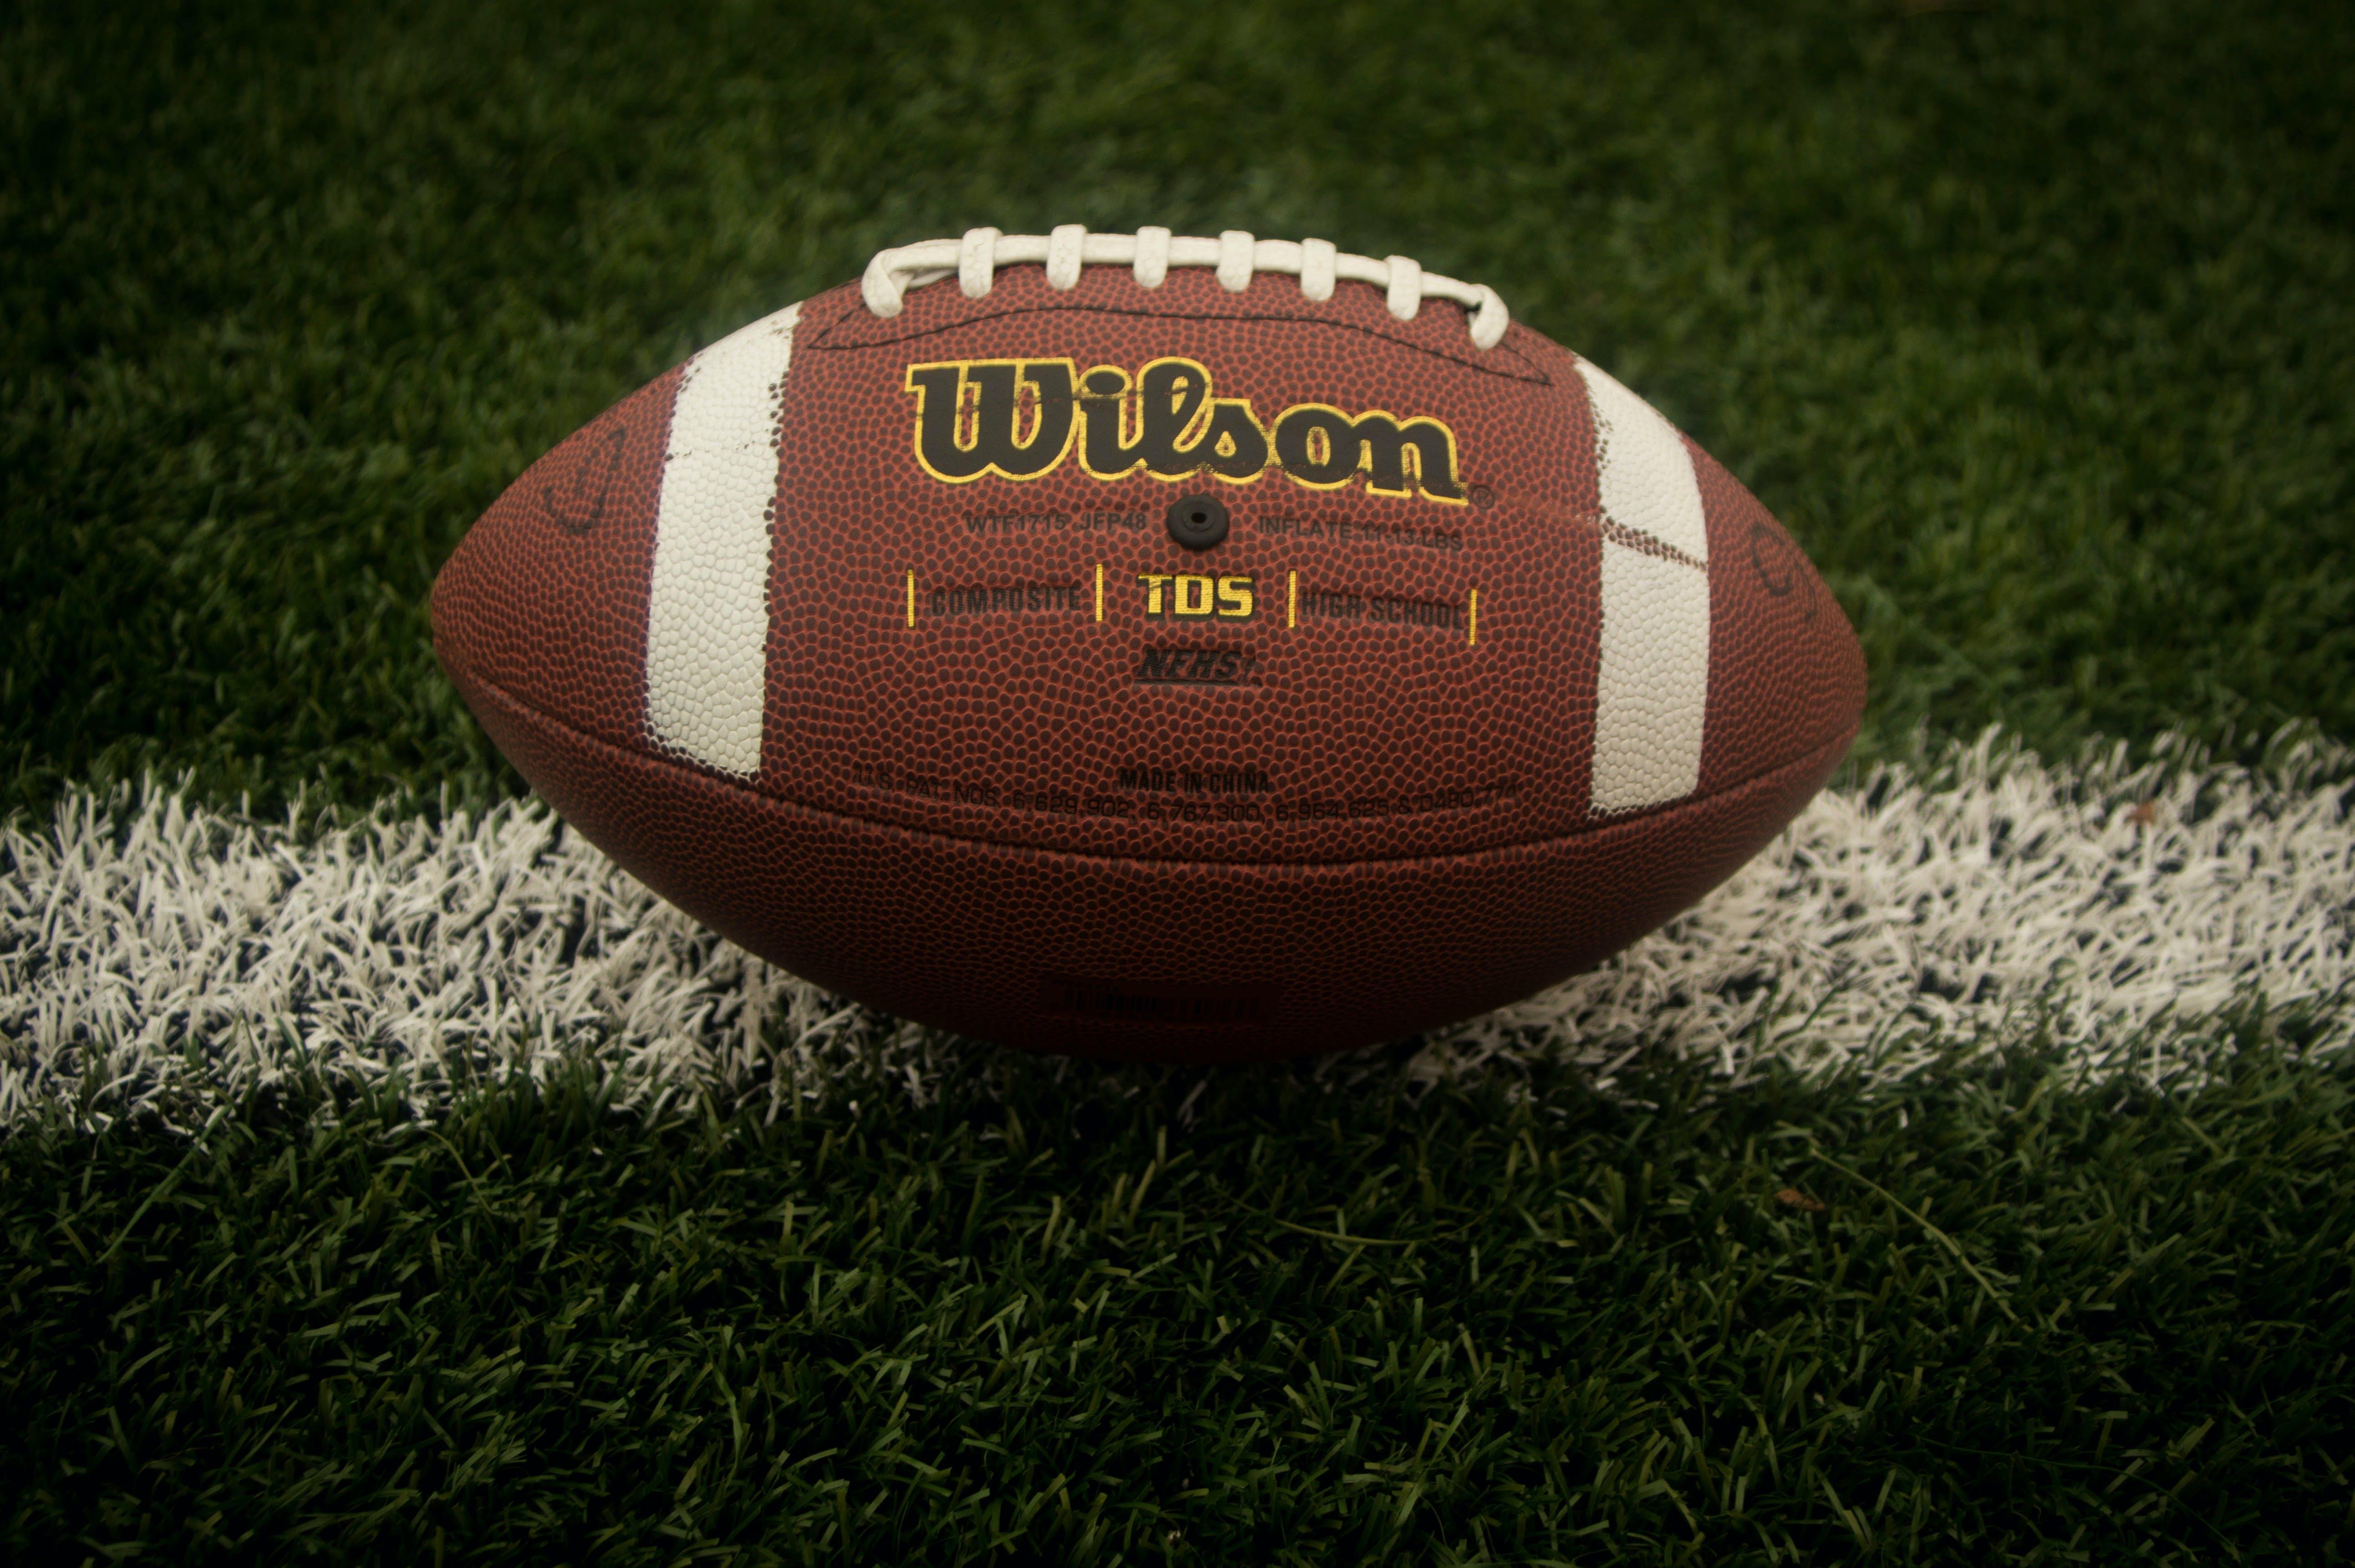 Kostenloses Stock Foto zu feld, sport, ball, amerika